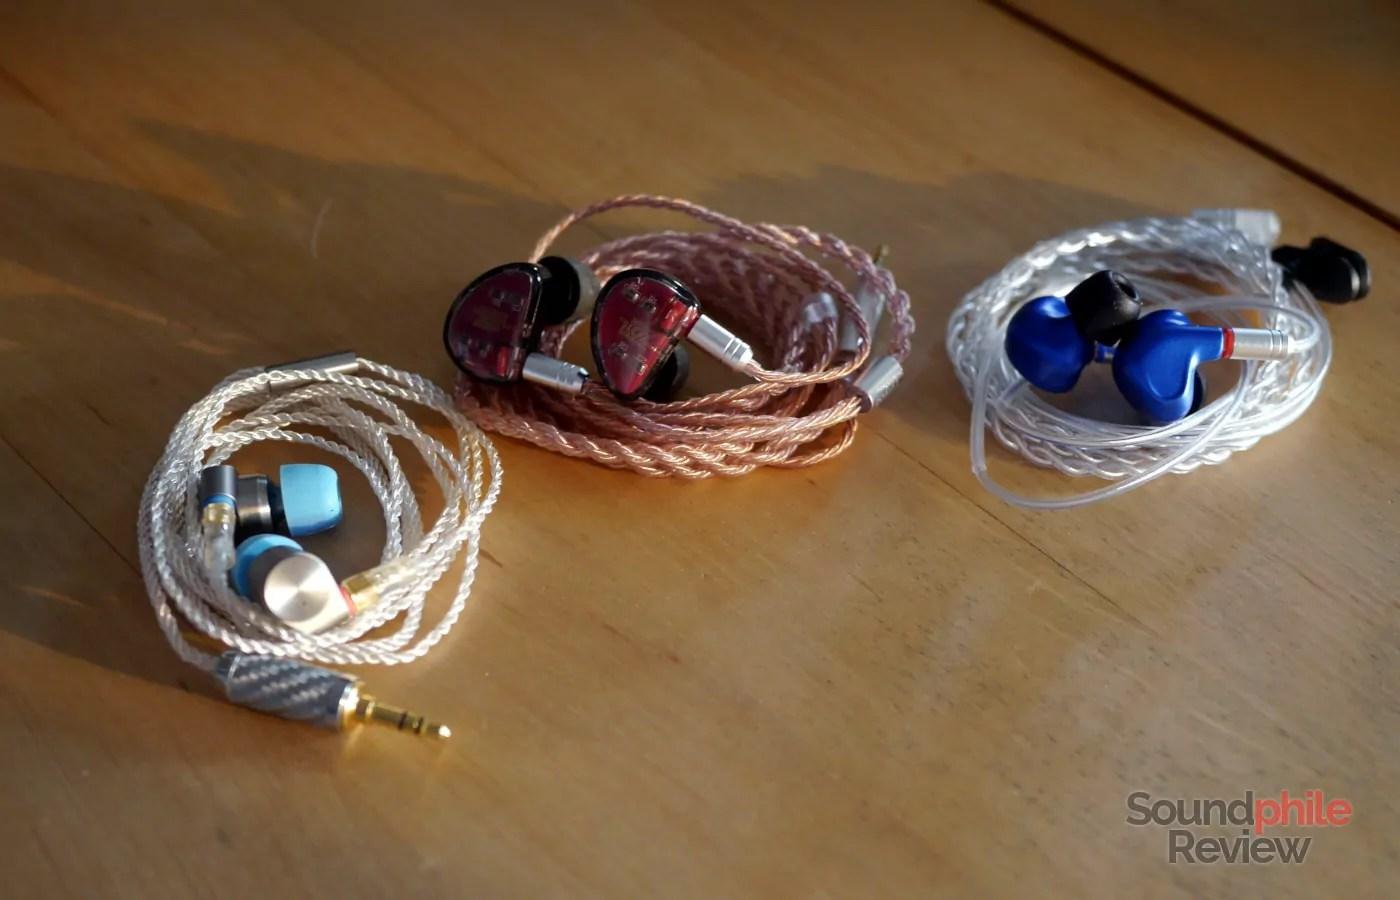 Tin Audio T2 Pro KZ AS10 BGVP DMG Headphones in Pictures